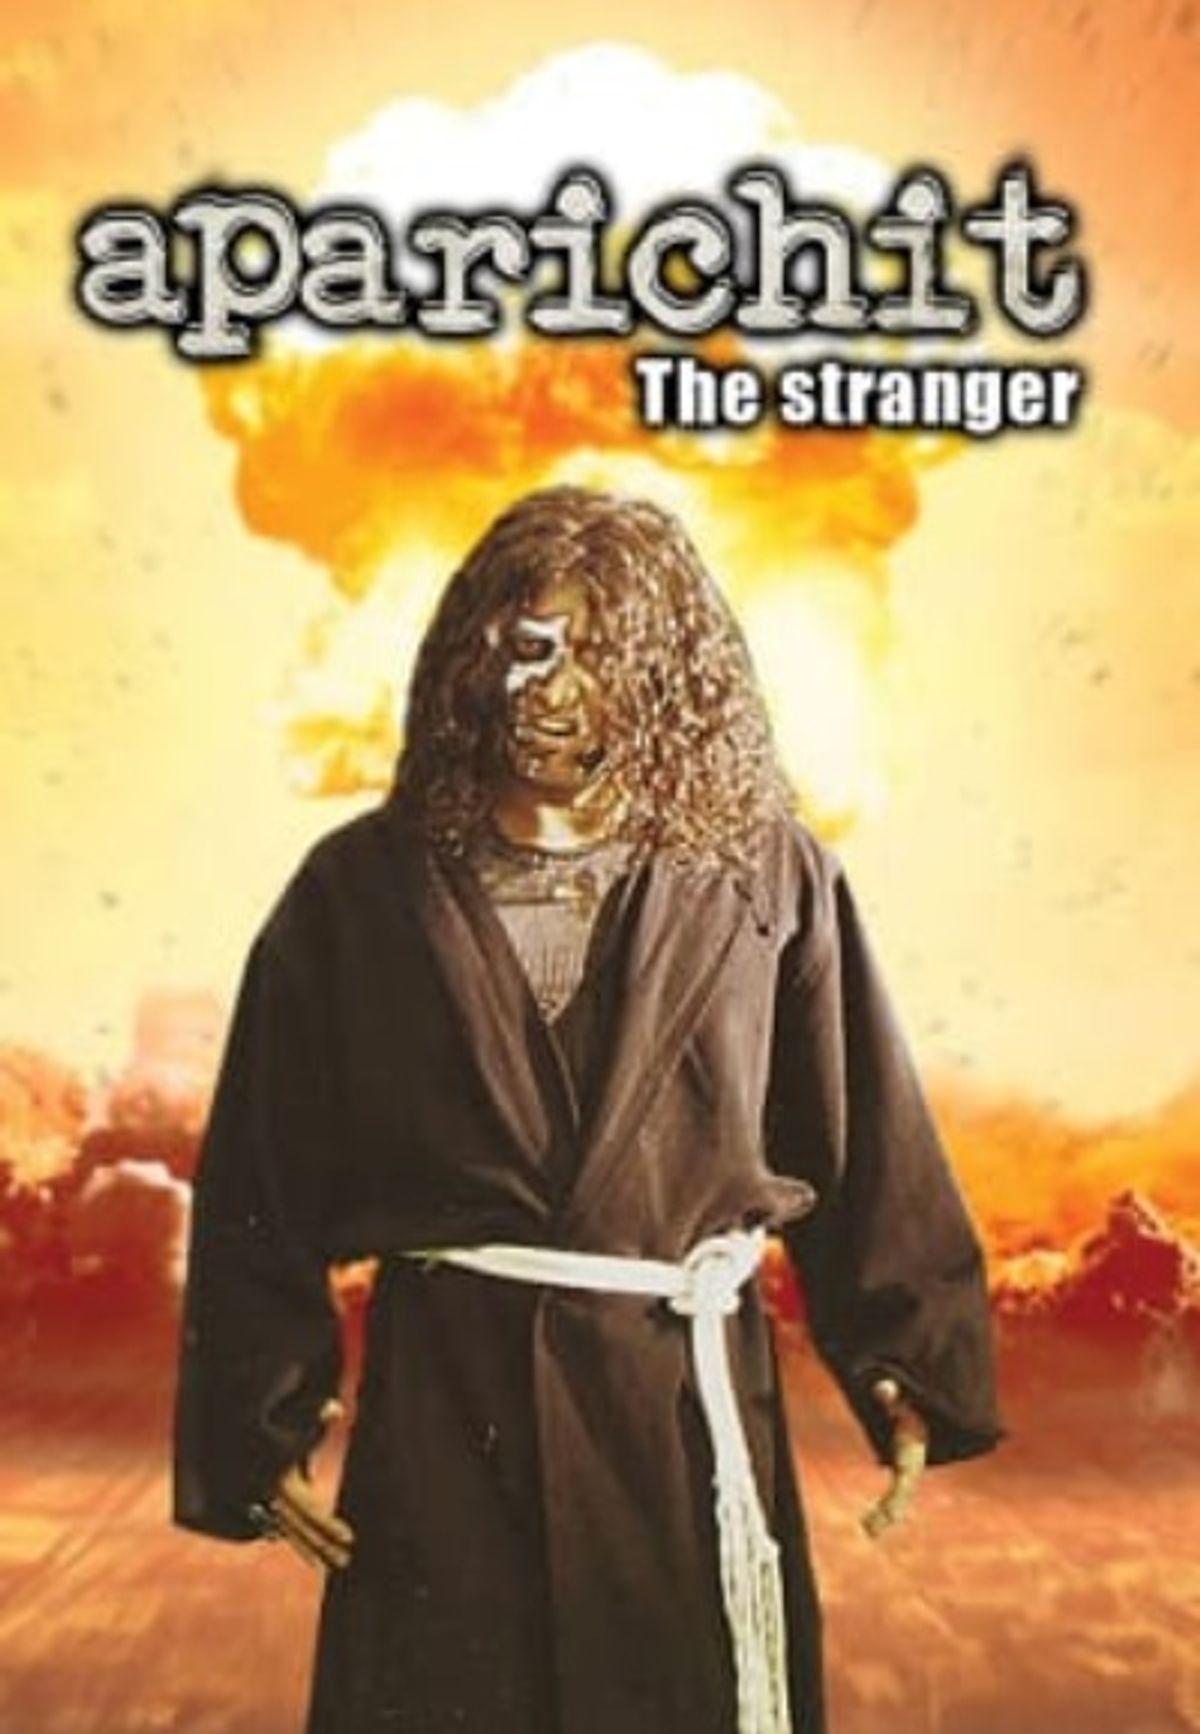 Aparichit The Stranger